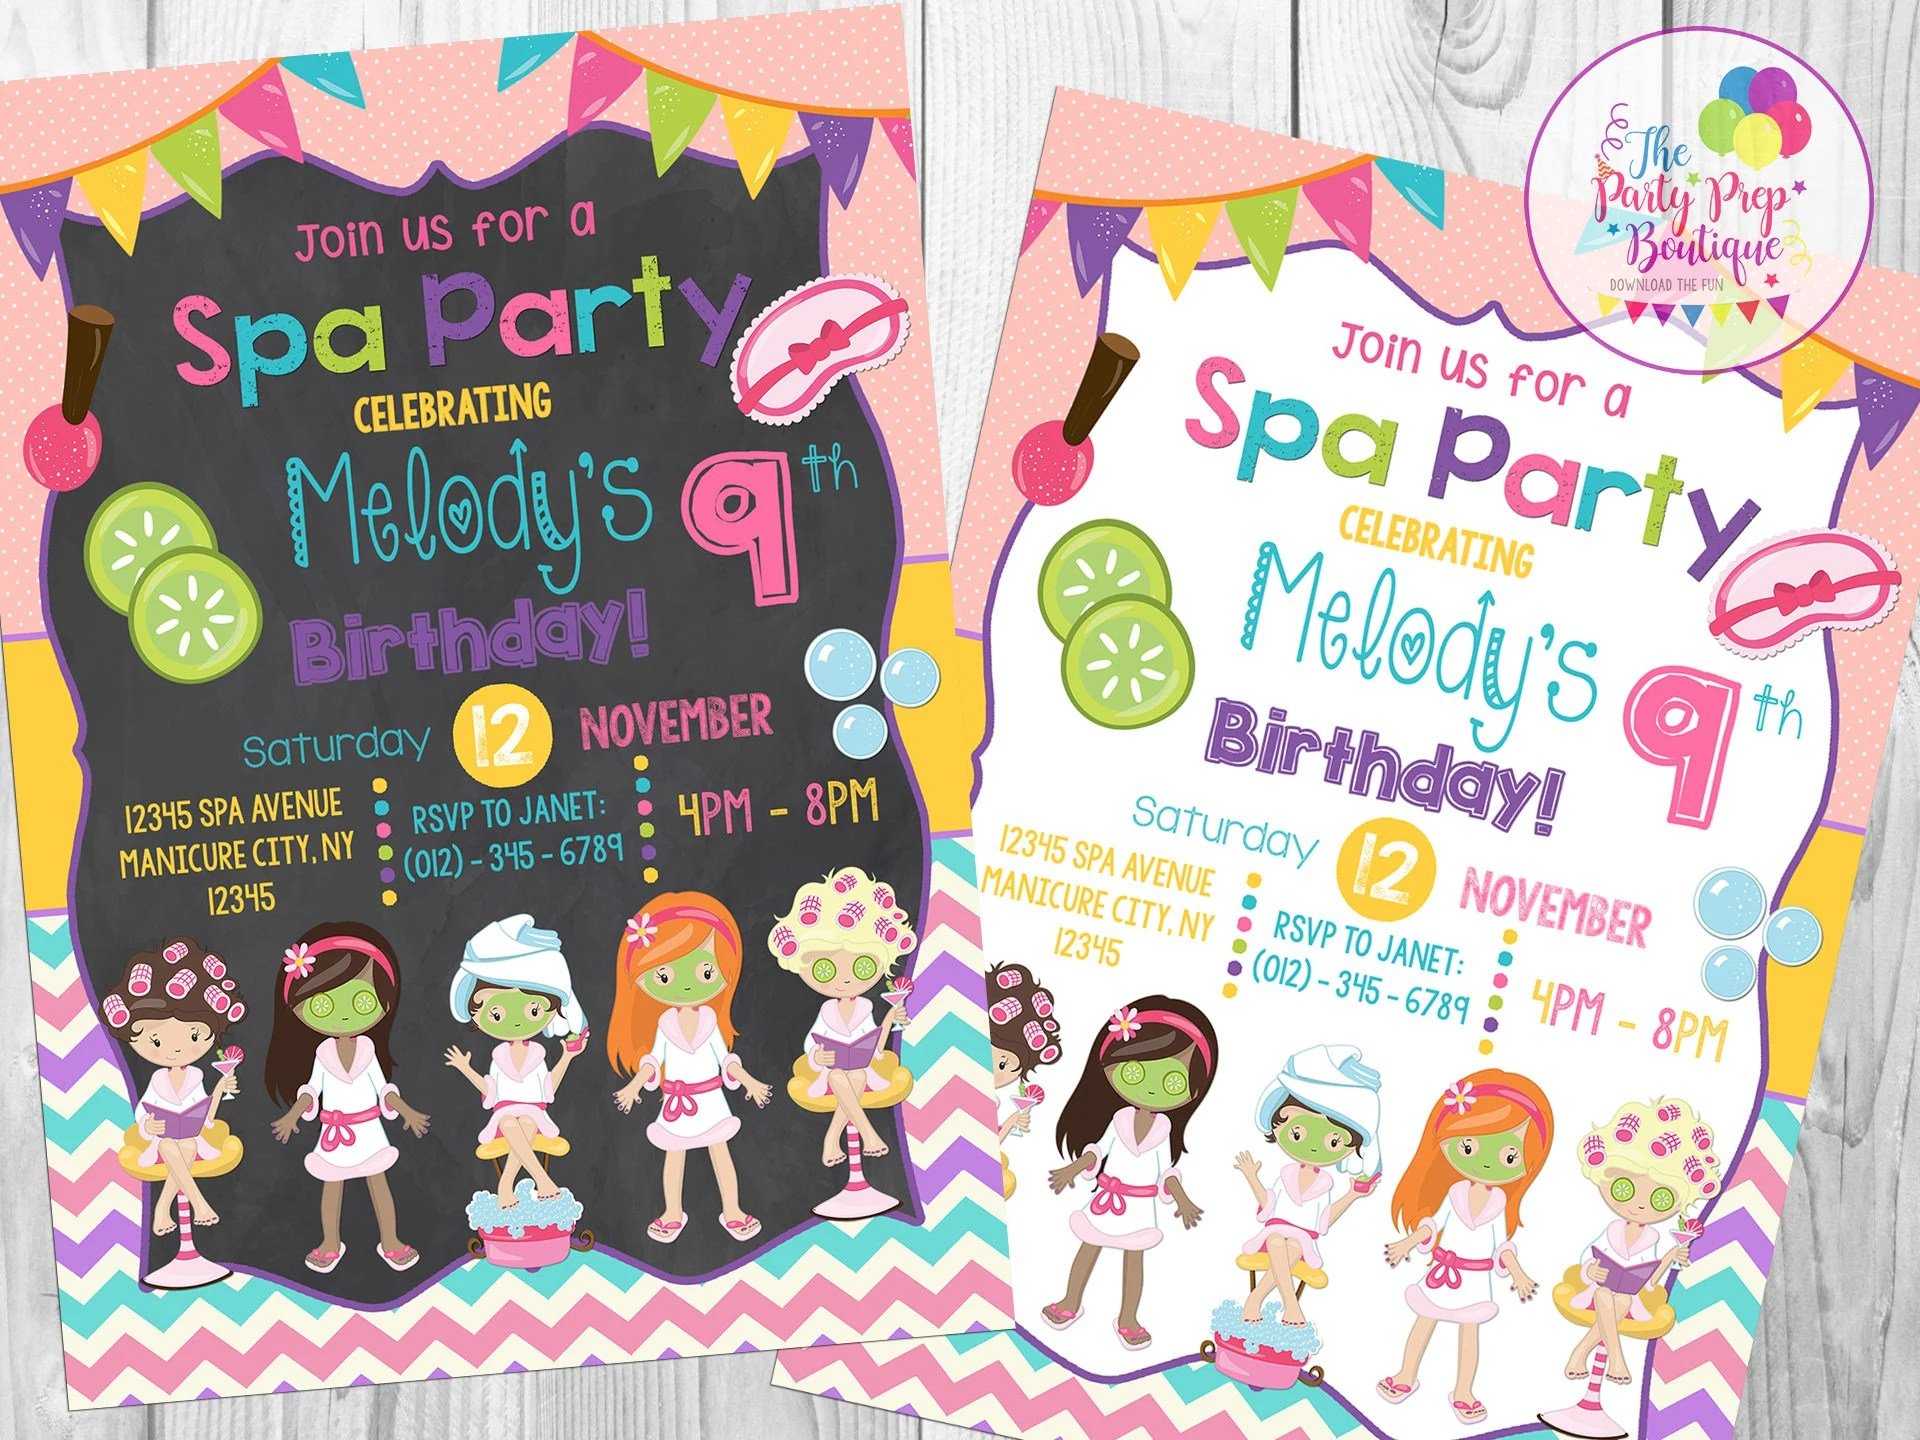 spa party invitation spa birthday party invitation kids spa party spa party invite pamper party spa birthday invite girls spa party